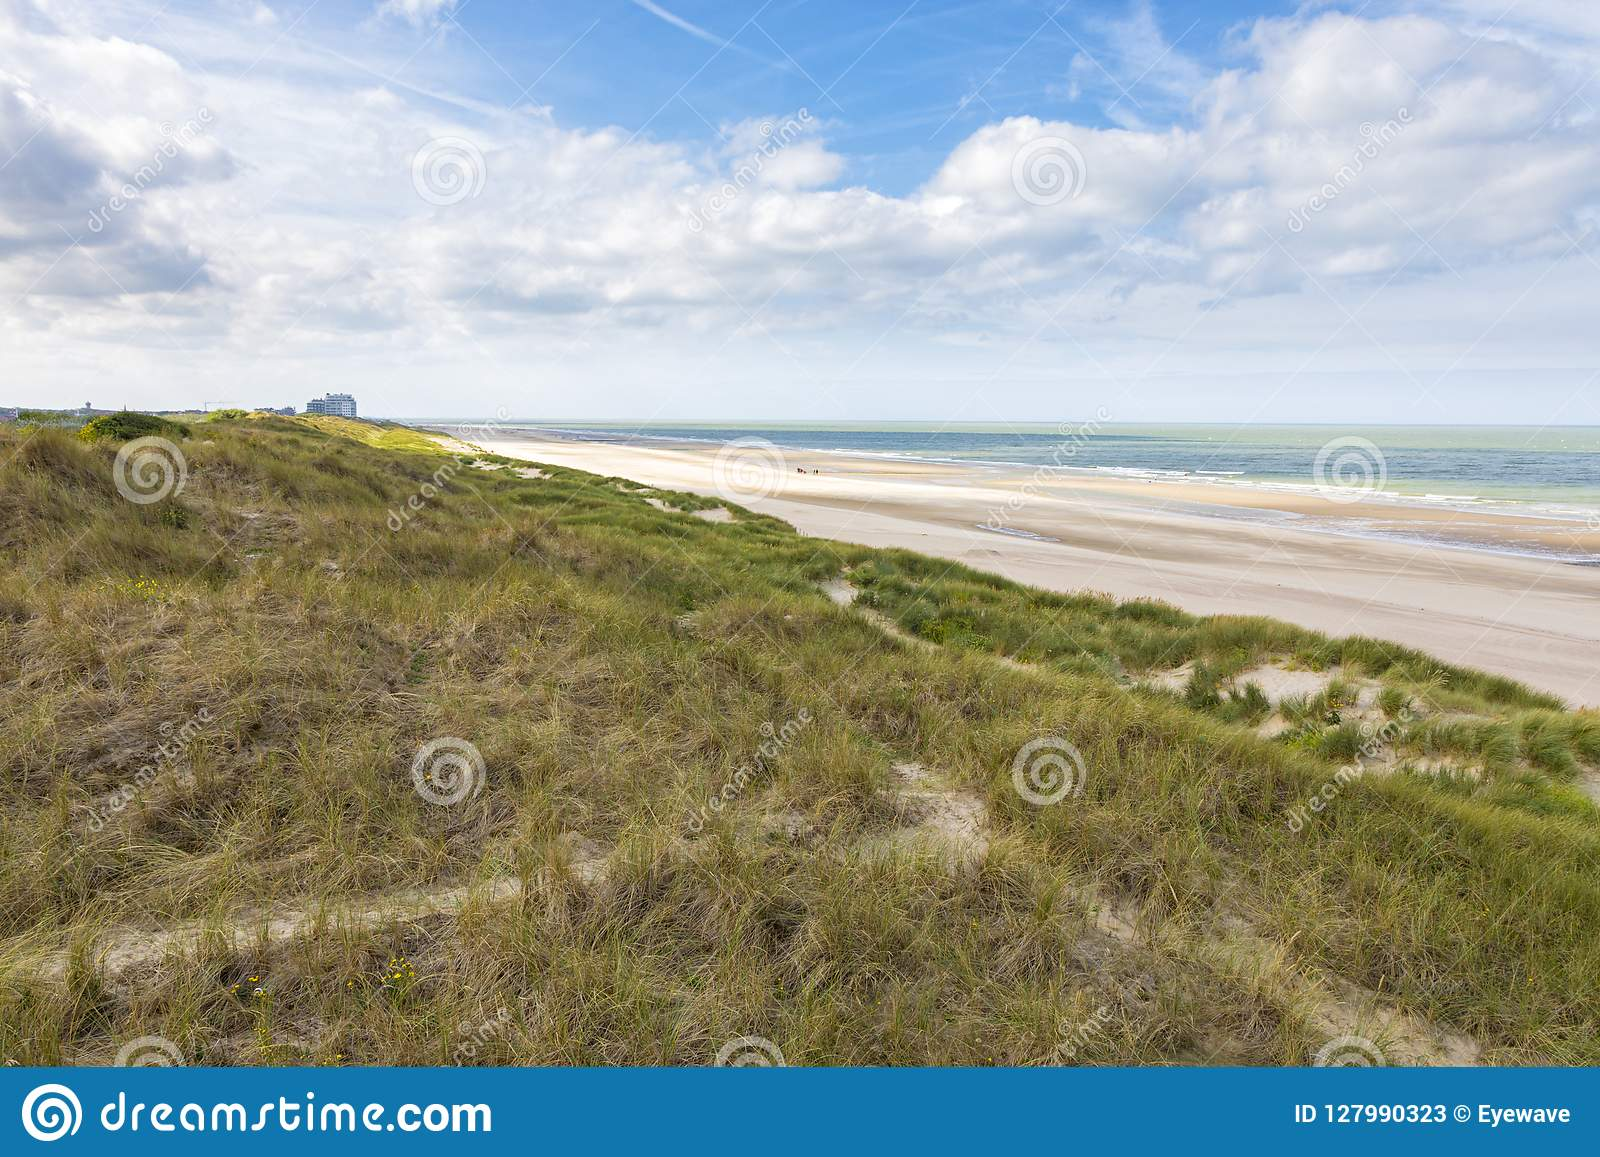 North Sea beach At Blankenberge, Belgium